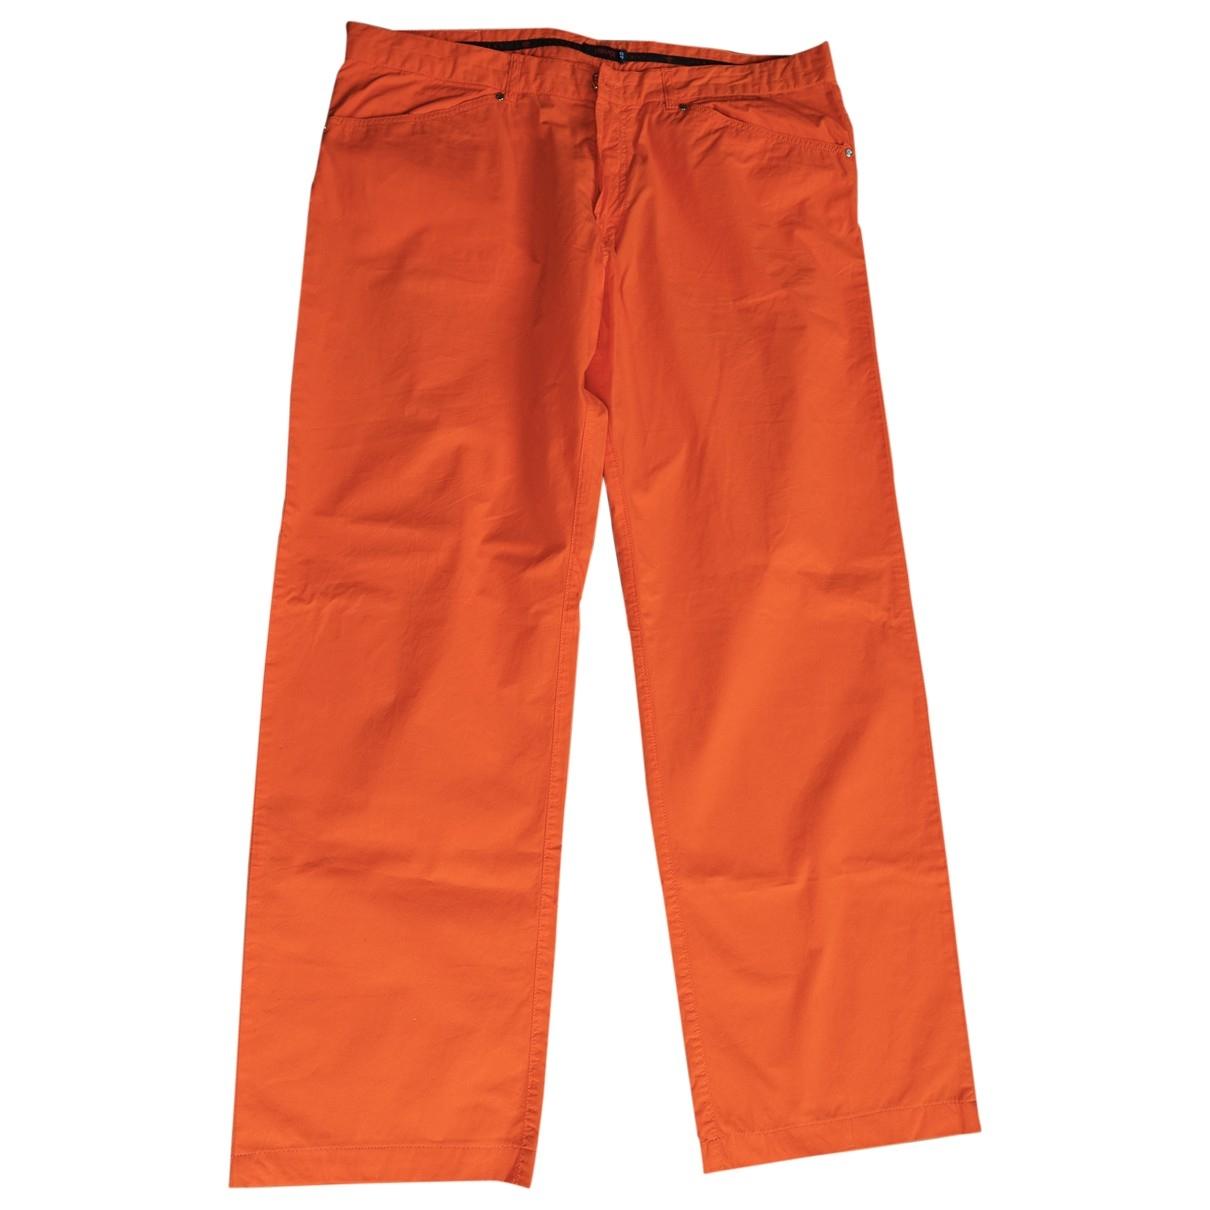 Versace \N Orange Cotton Jeans for Men 40 FR